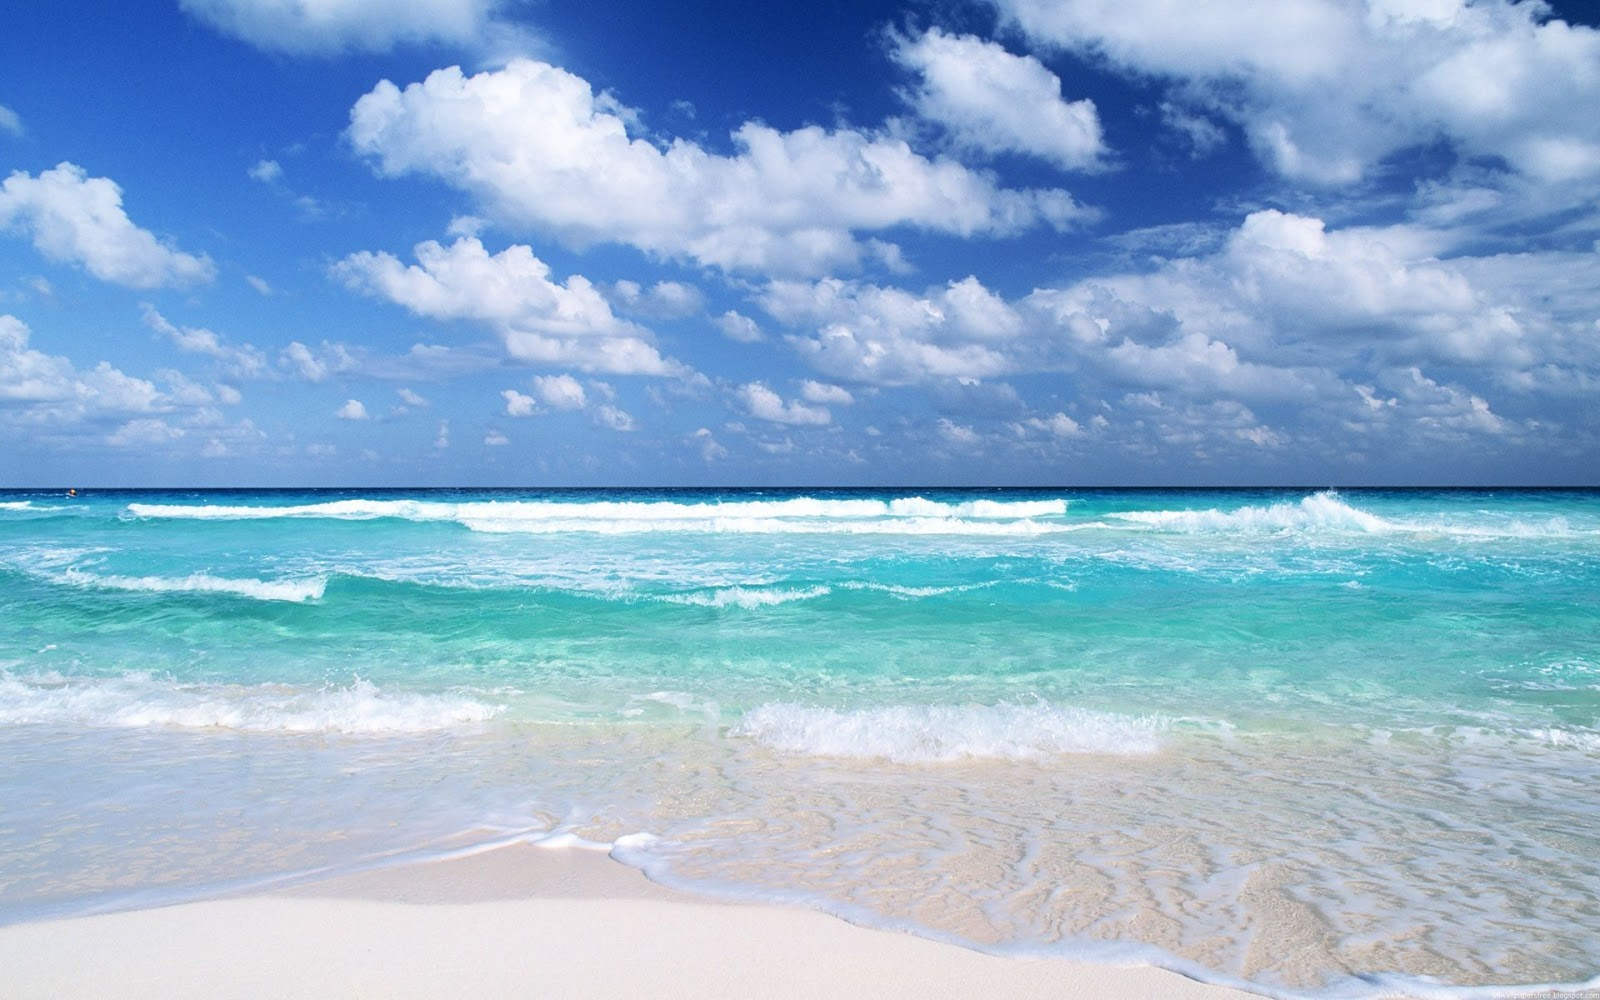 download popular wallpapers 5 stars beach desktop hd